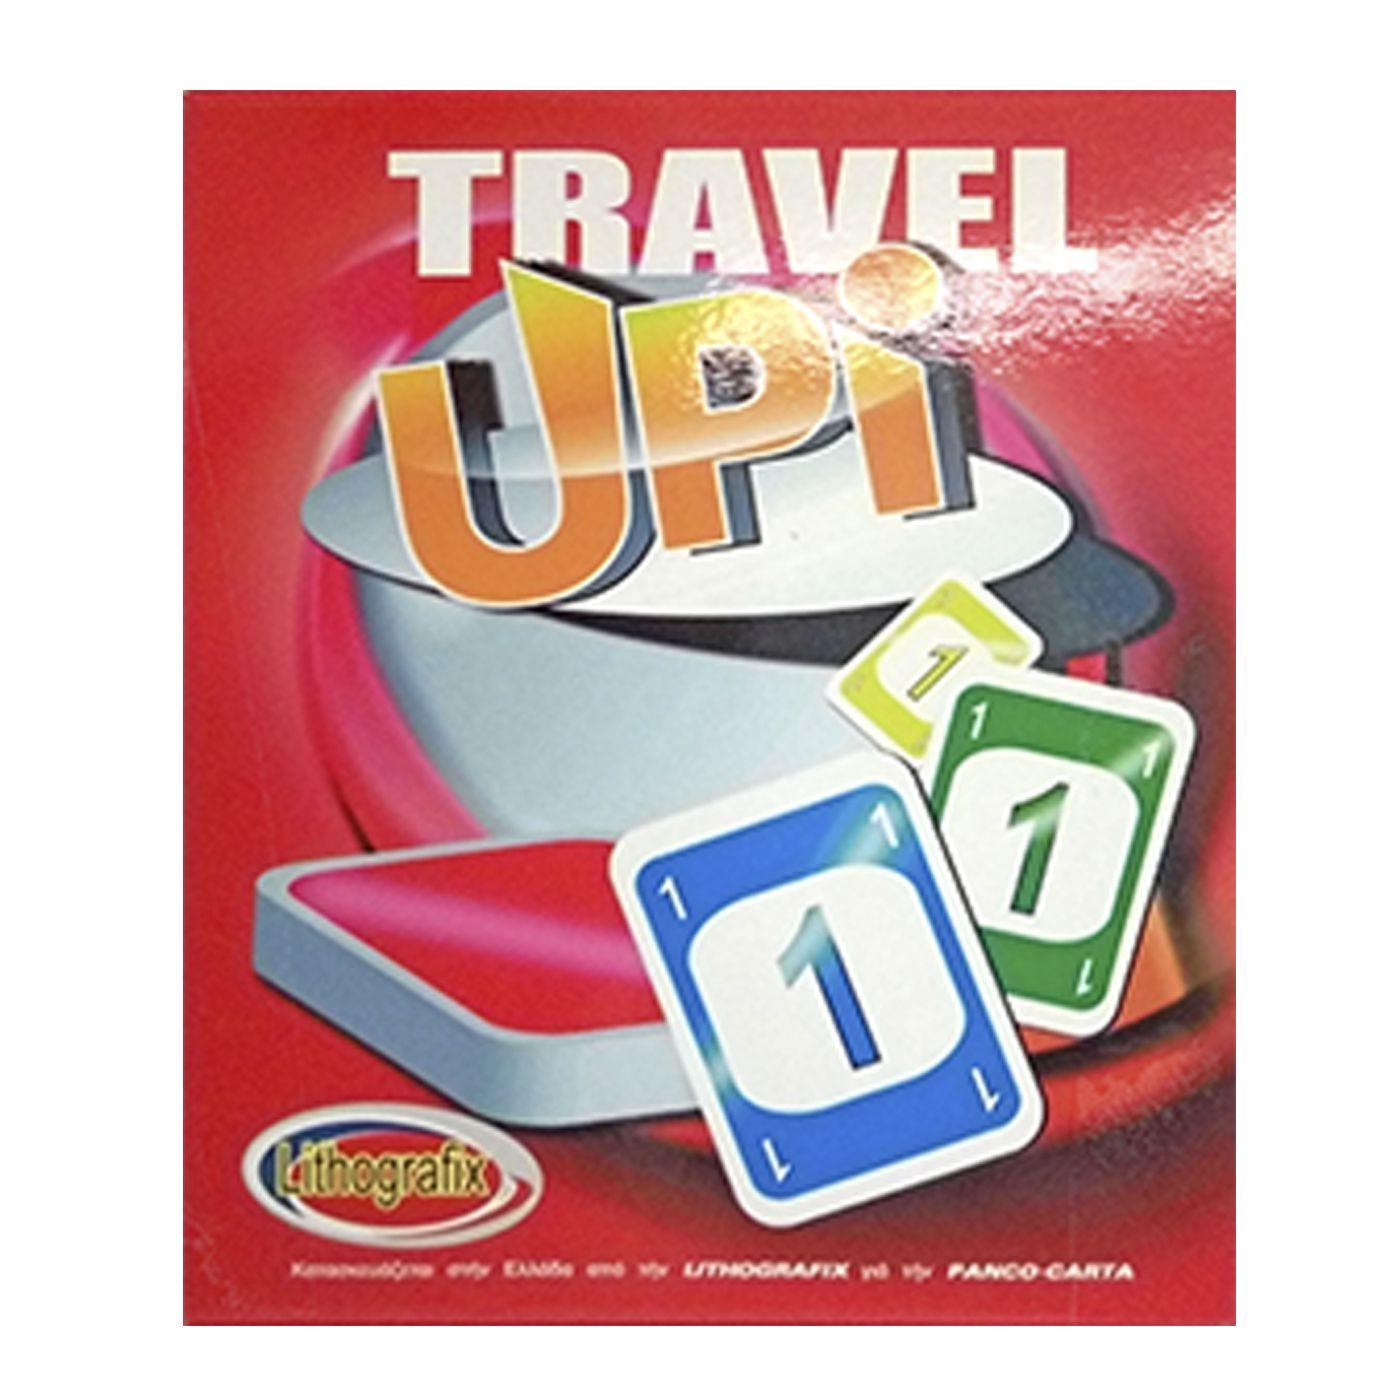 - UPI TRAVEL 16x20cm - - - - 69-1548 παιχνίδια   επιτραπέζια   επιτραπέζια παιχνίδια